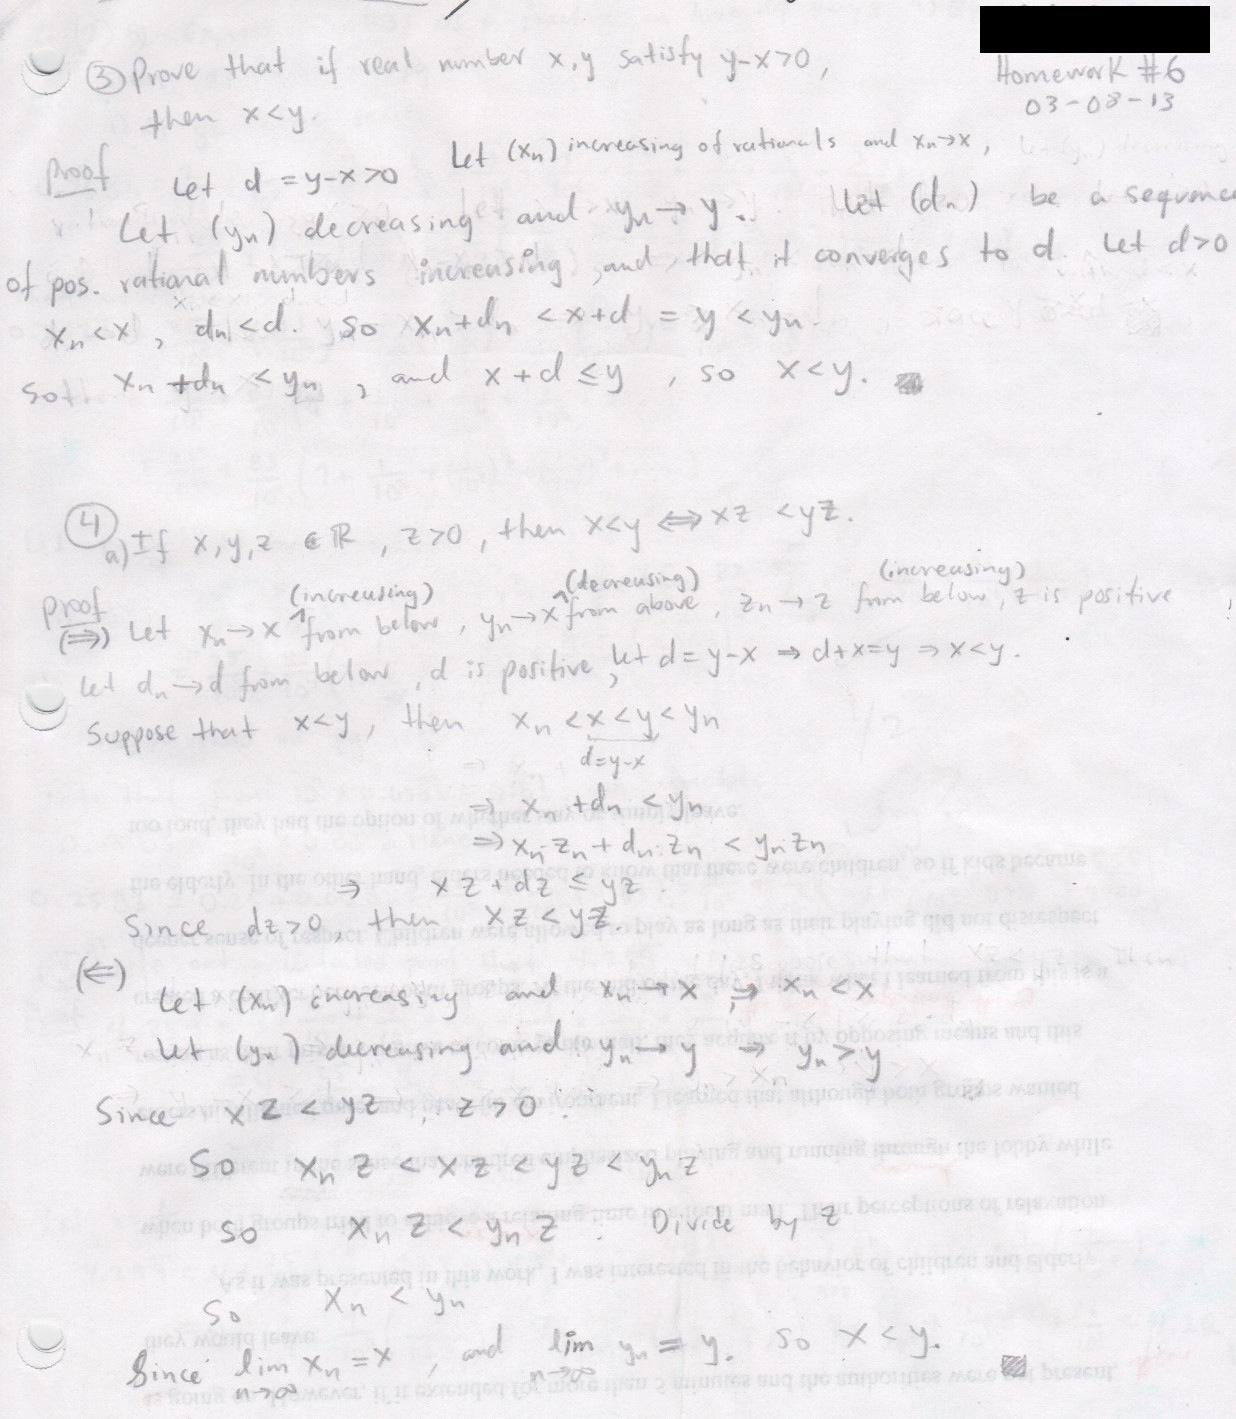 My old math homework from UC Berkeley : Math 153 hw6